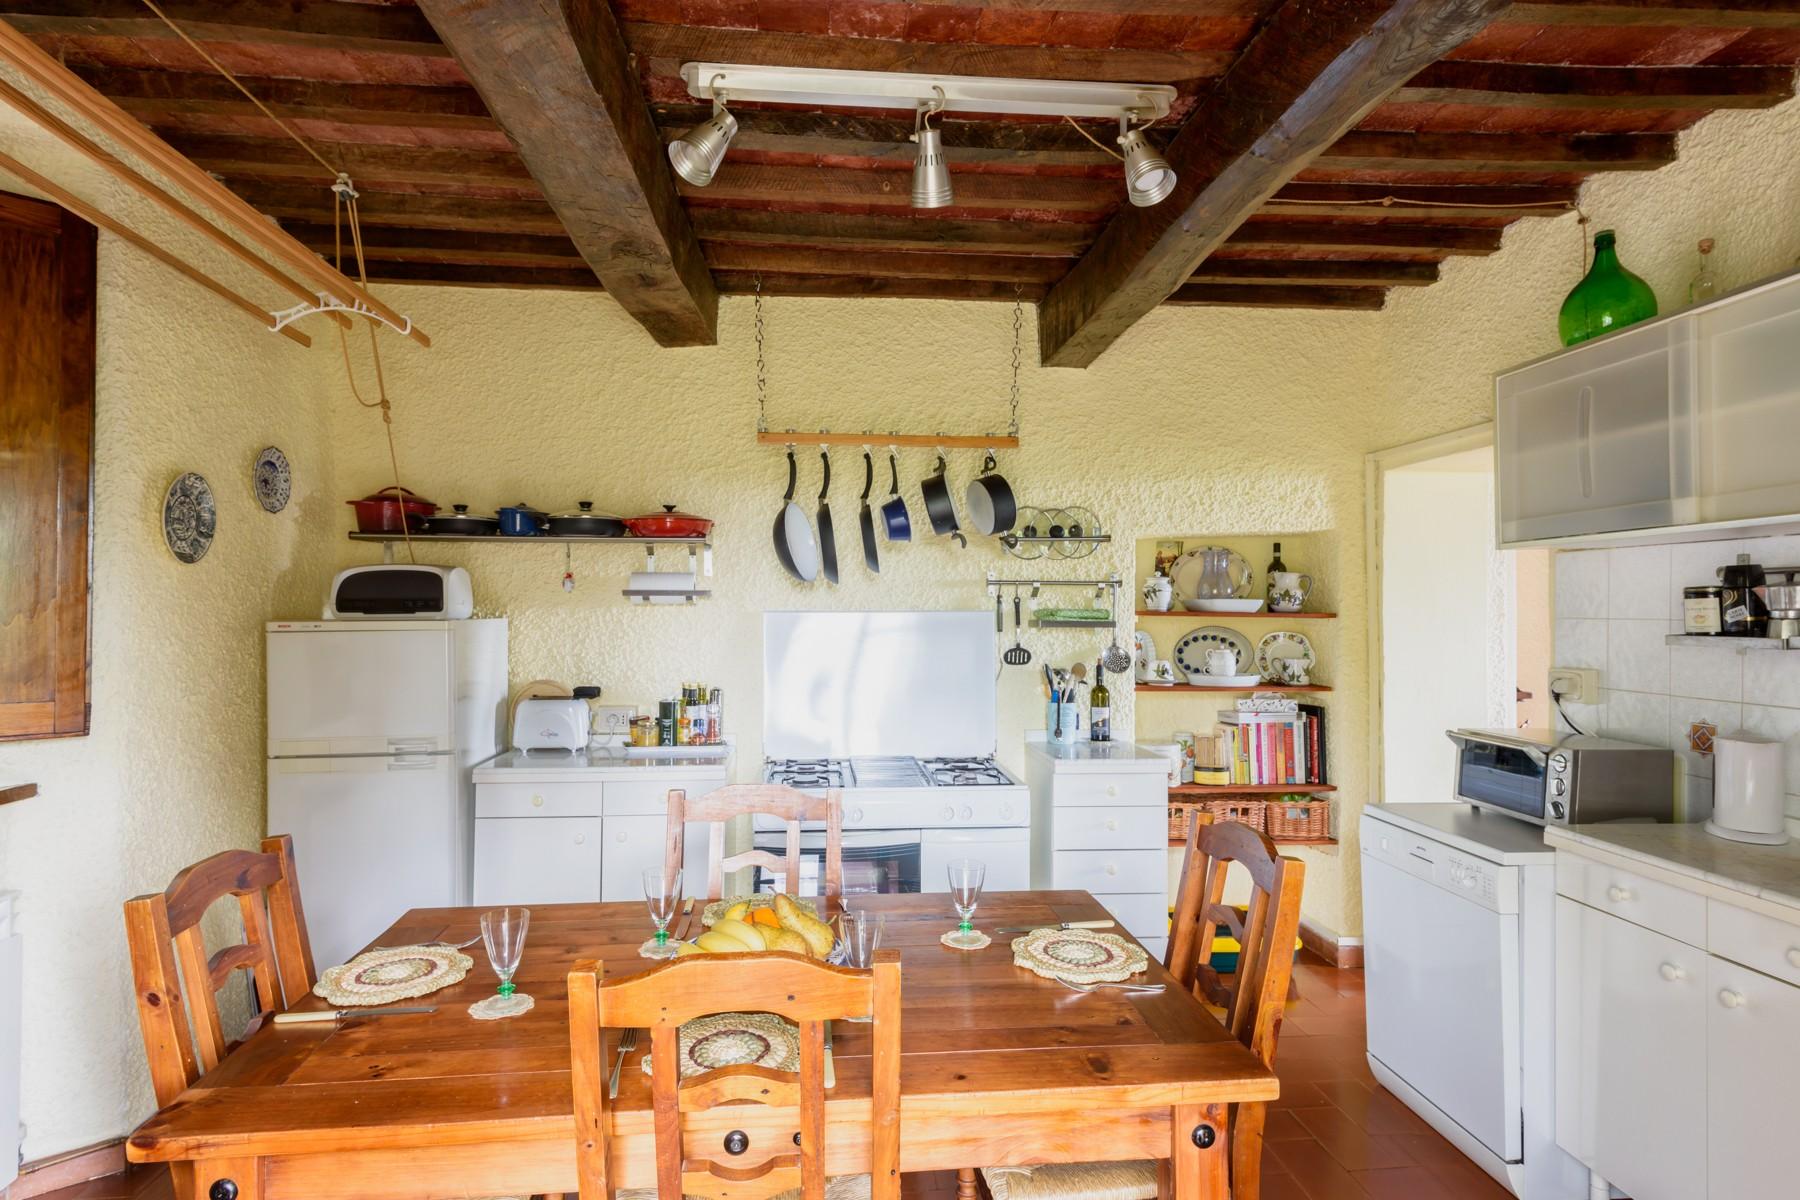 Casa indipendente in Vendita a Semproniano: 4 locali, 220 mq - Foto 13